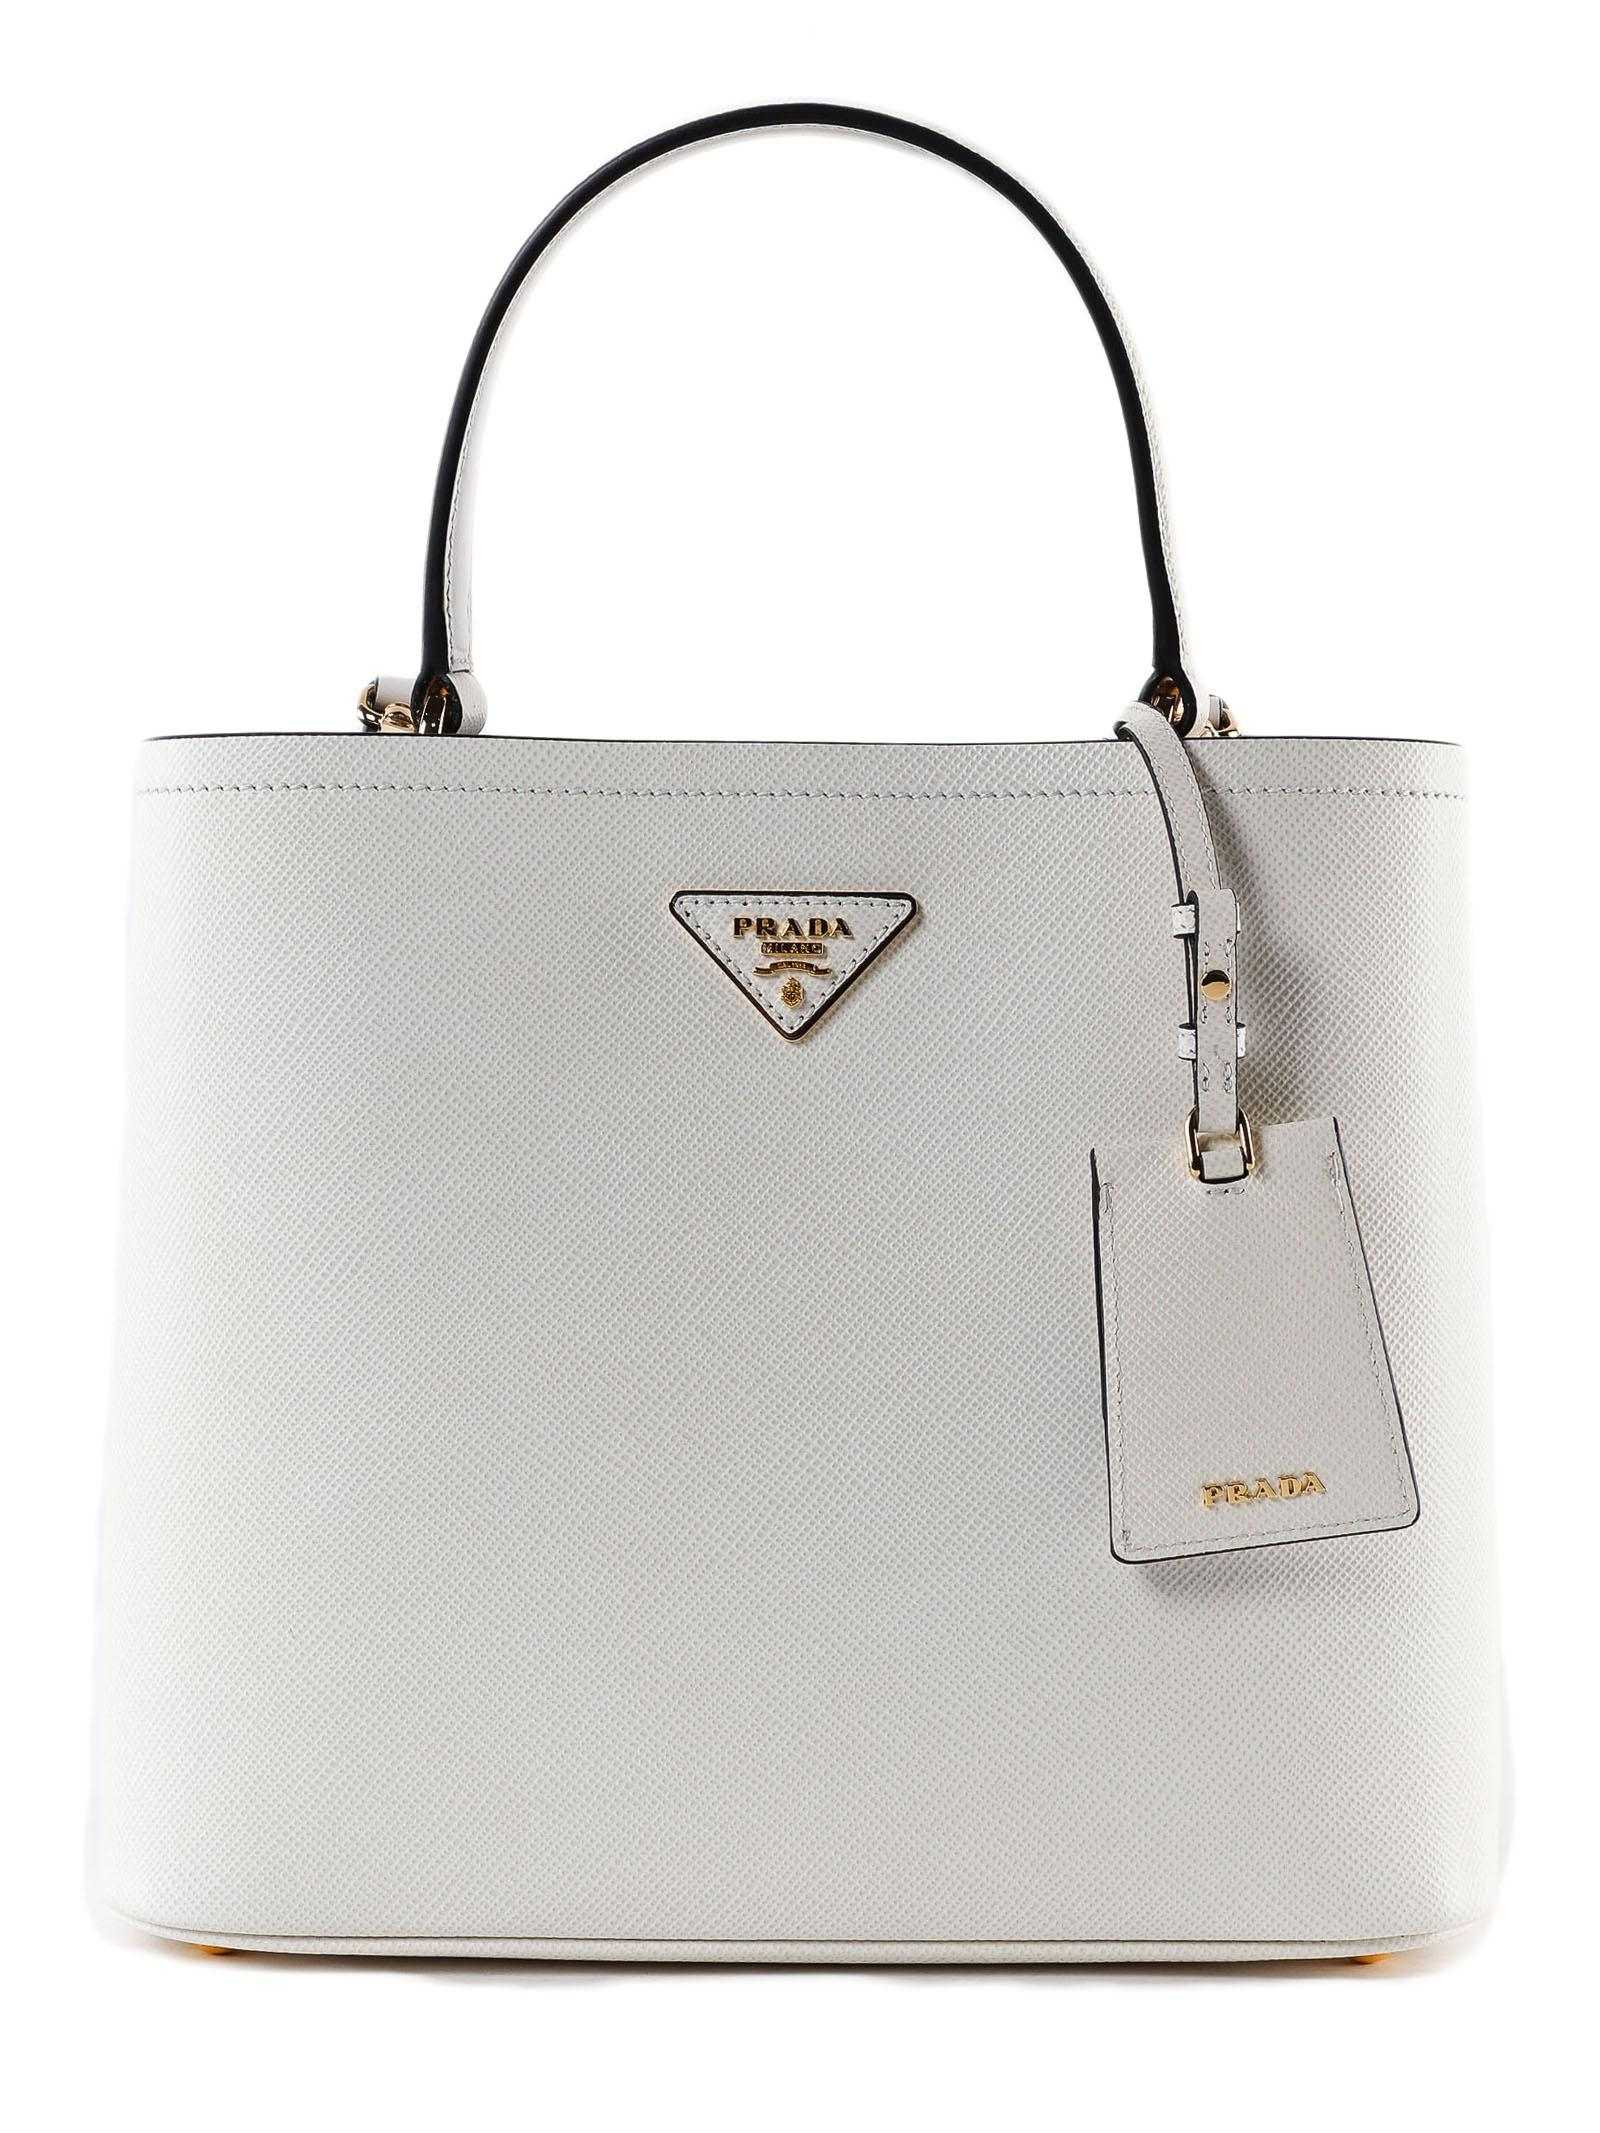 40fc4f4613bf Prada - Multicolor Handbag Saffiano+city Calf - Lyst. View fullscreen